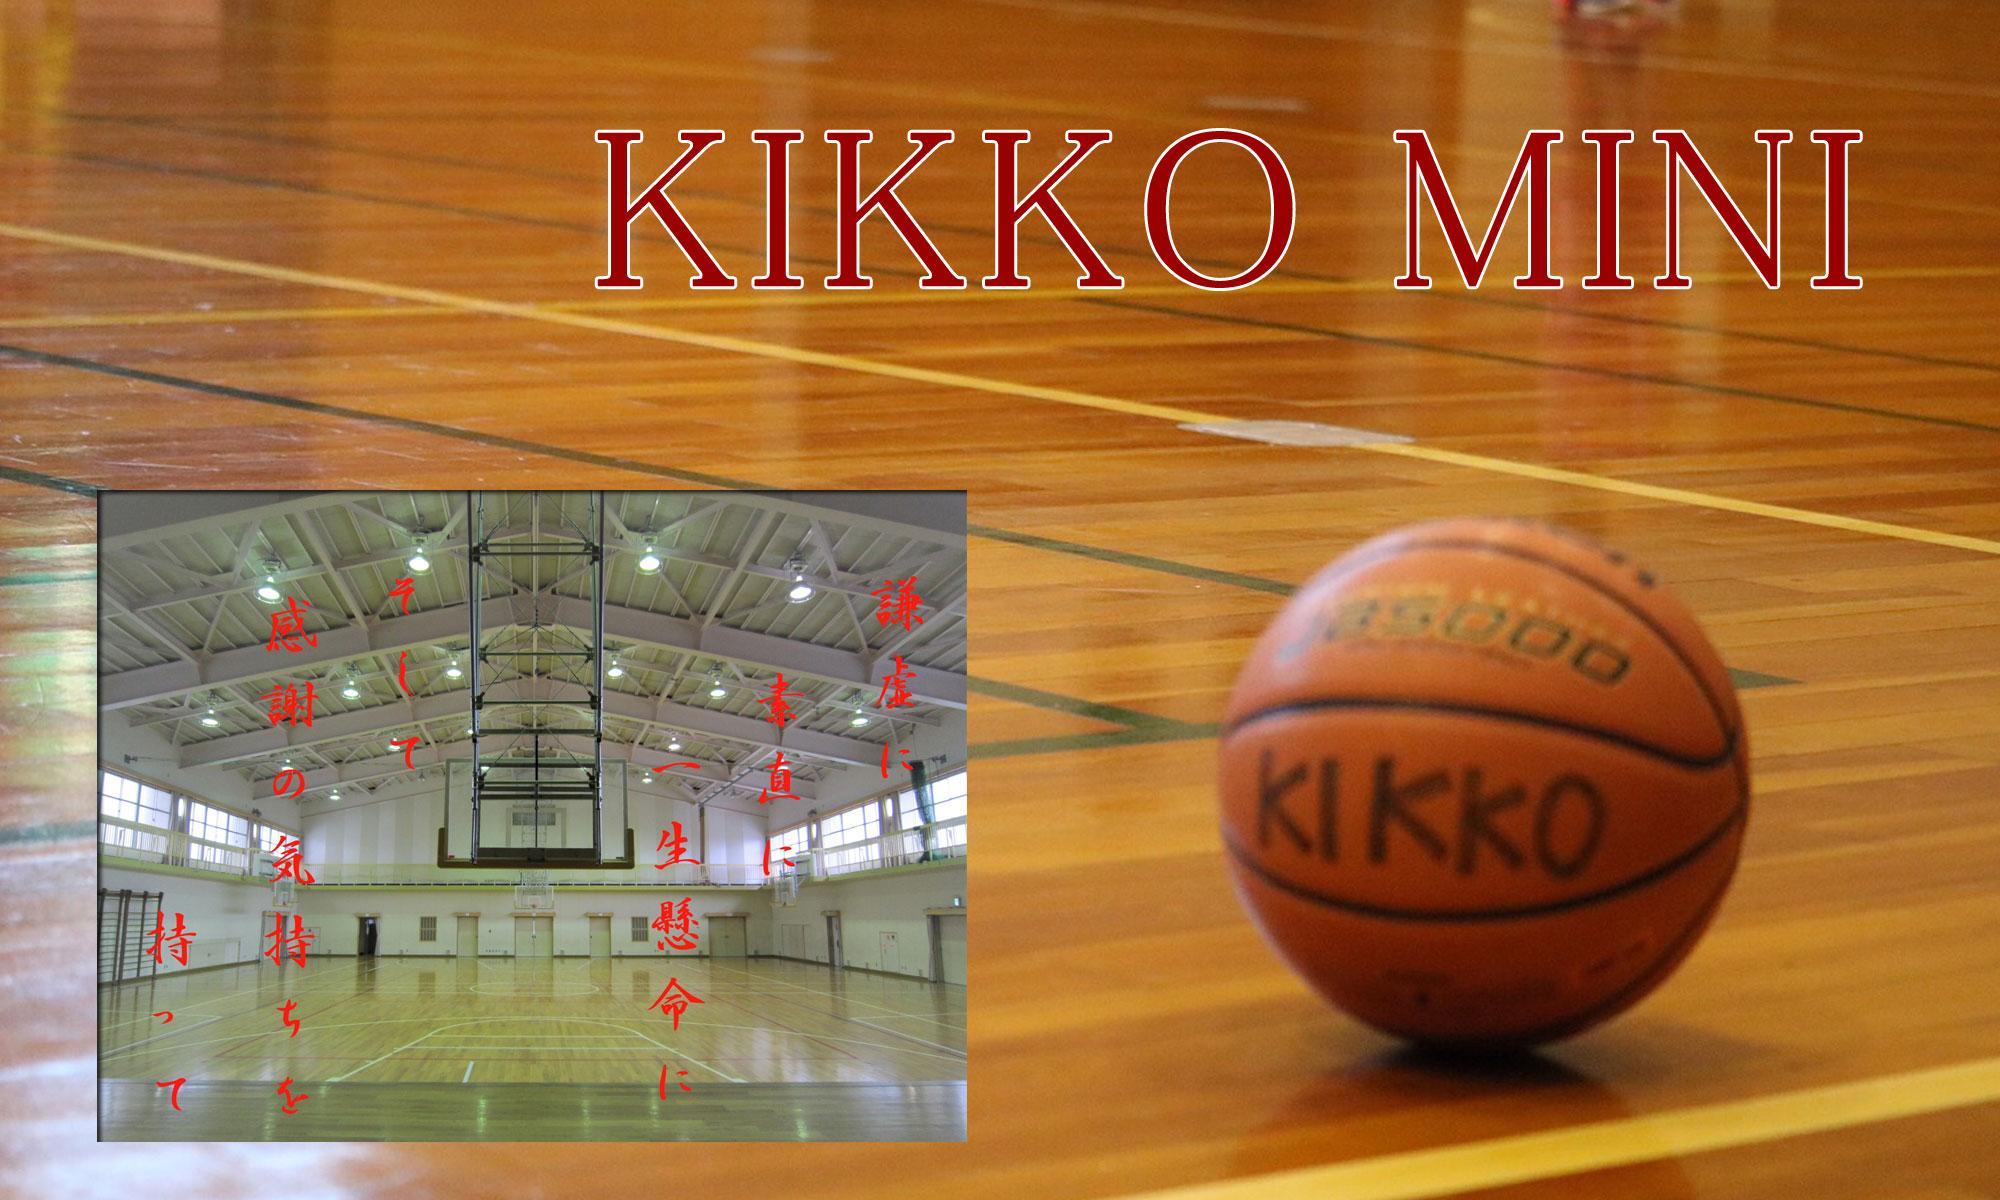 Kikkoミニバスケットボールクラブ